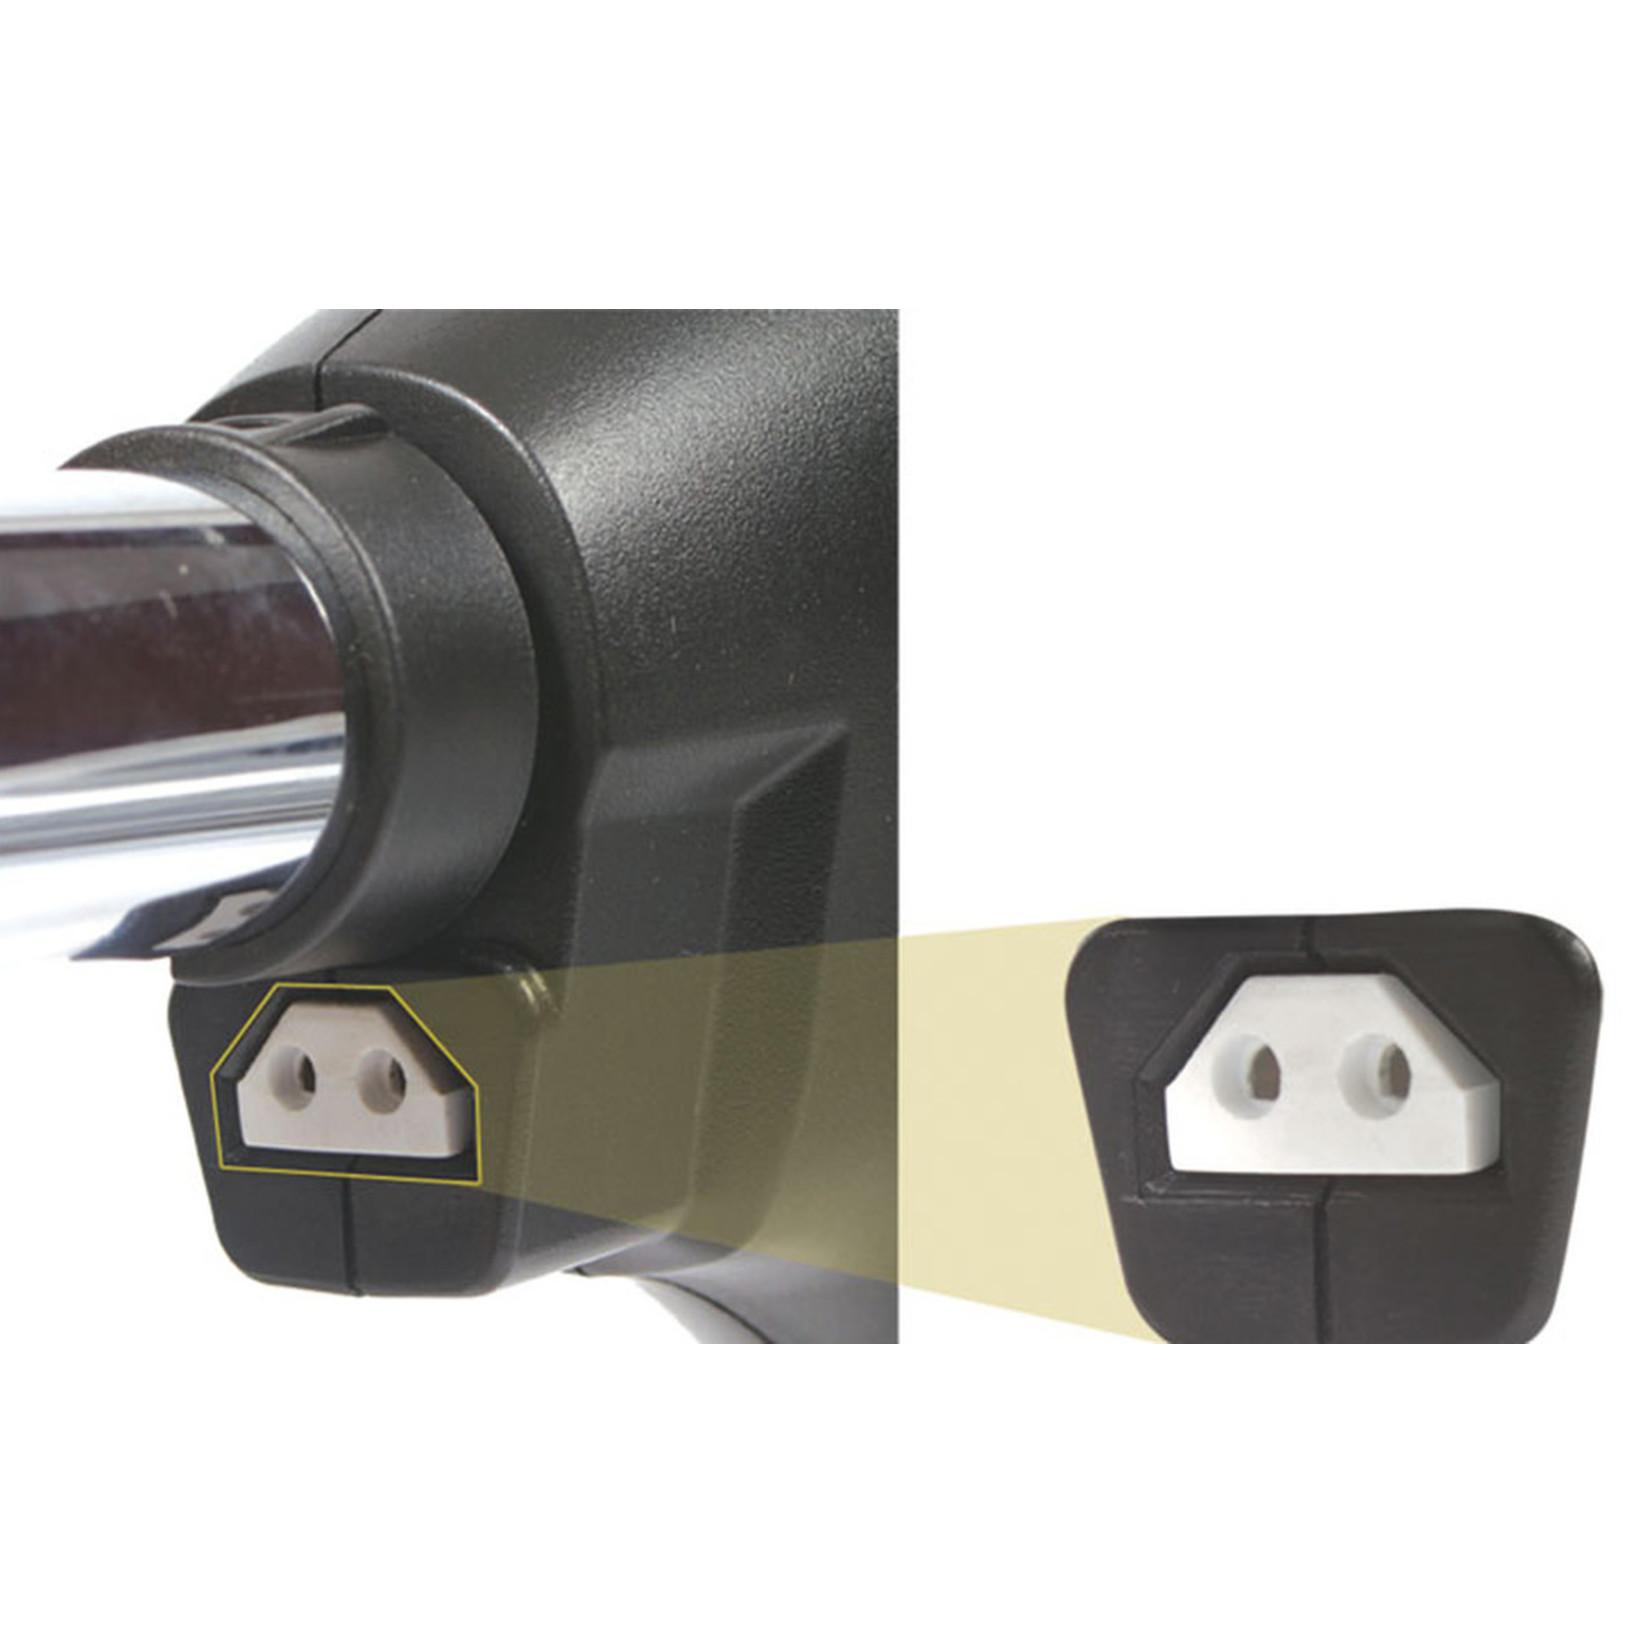 Centec Centec Telescopic Wand - Flush w/Long Tube